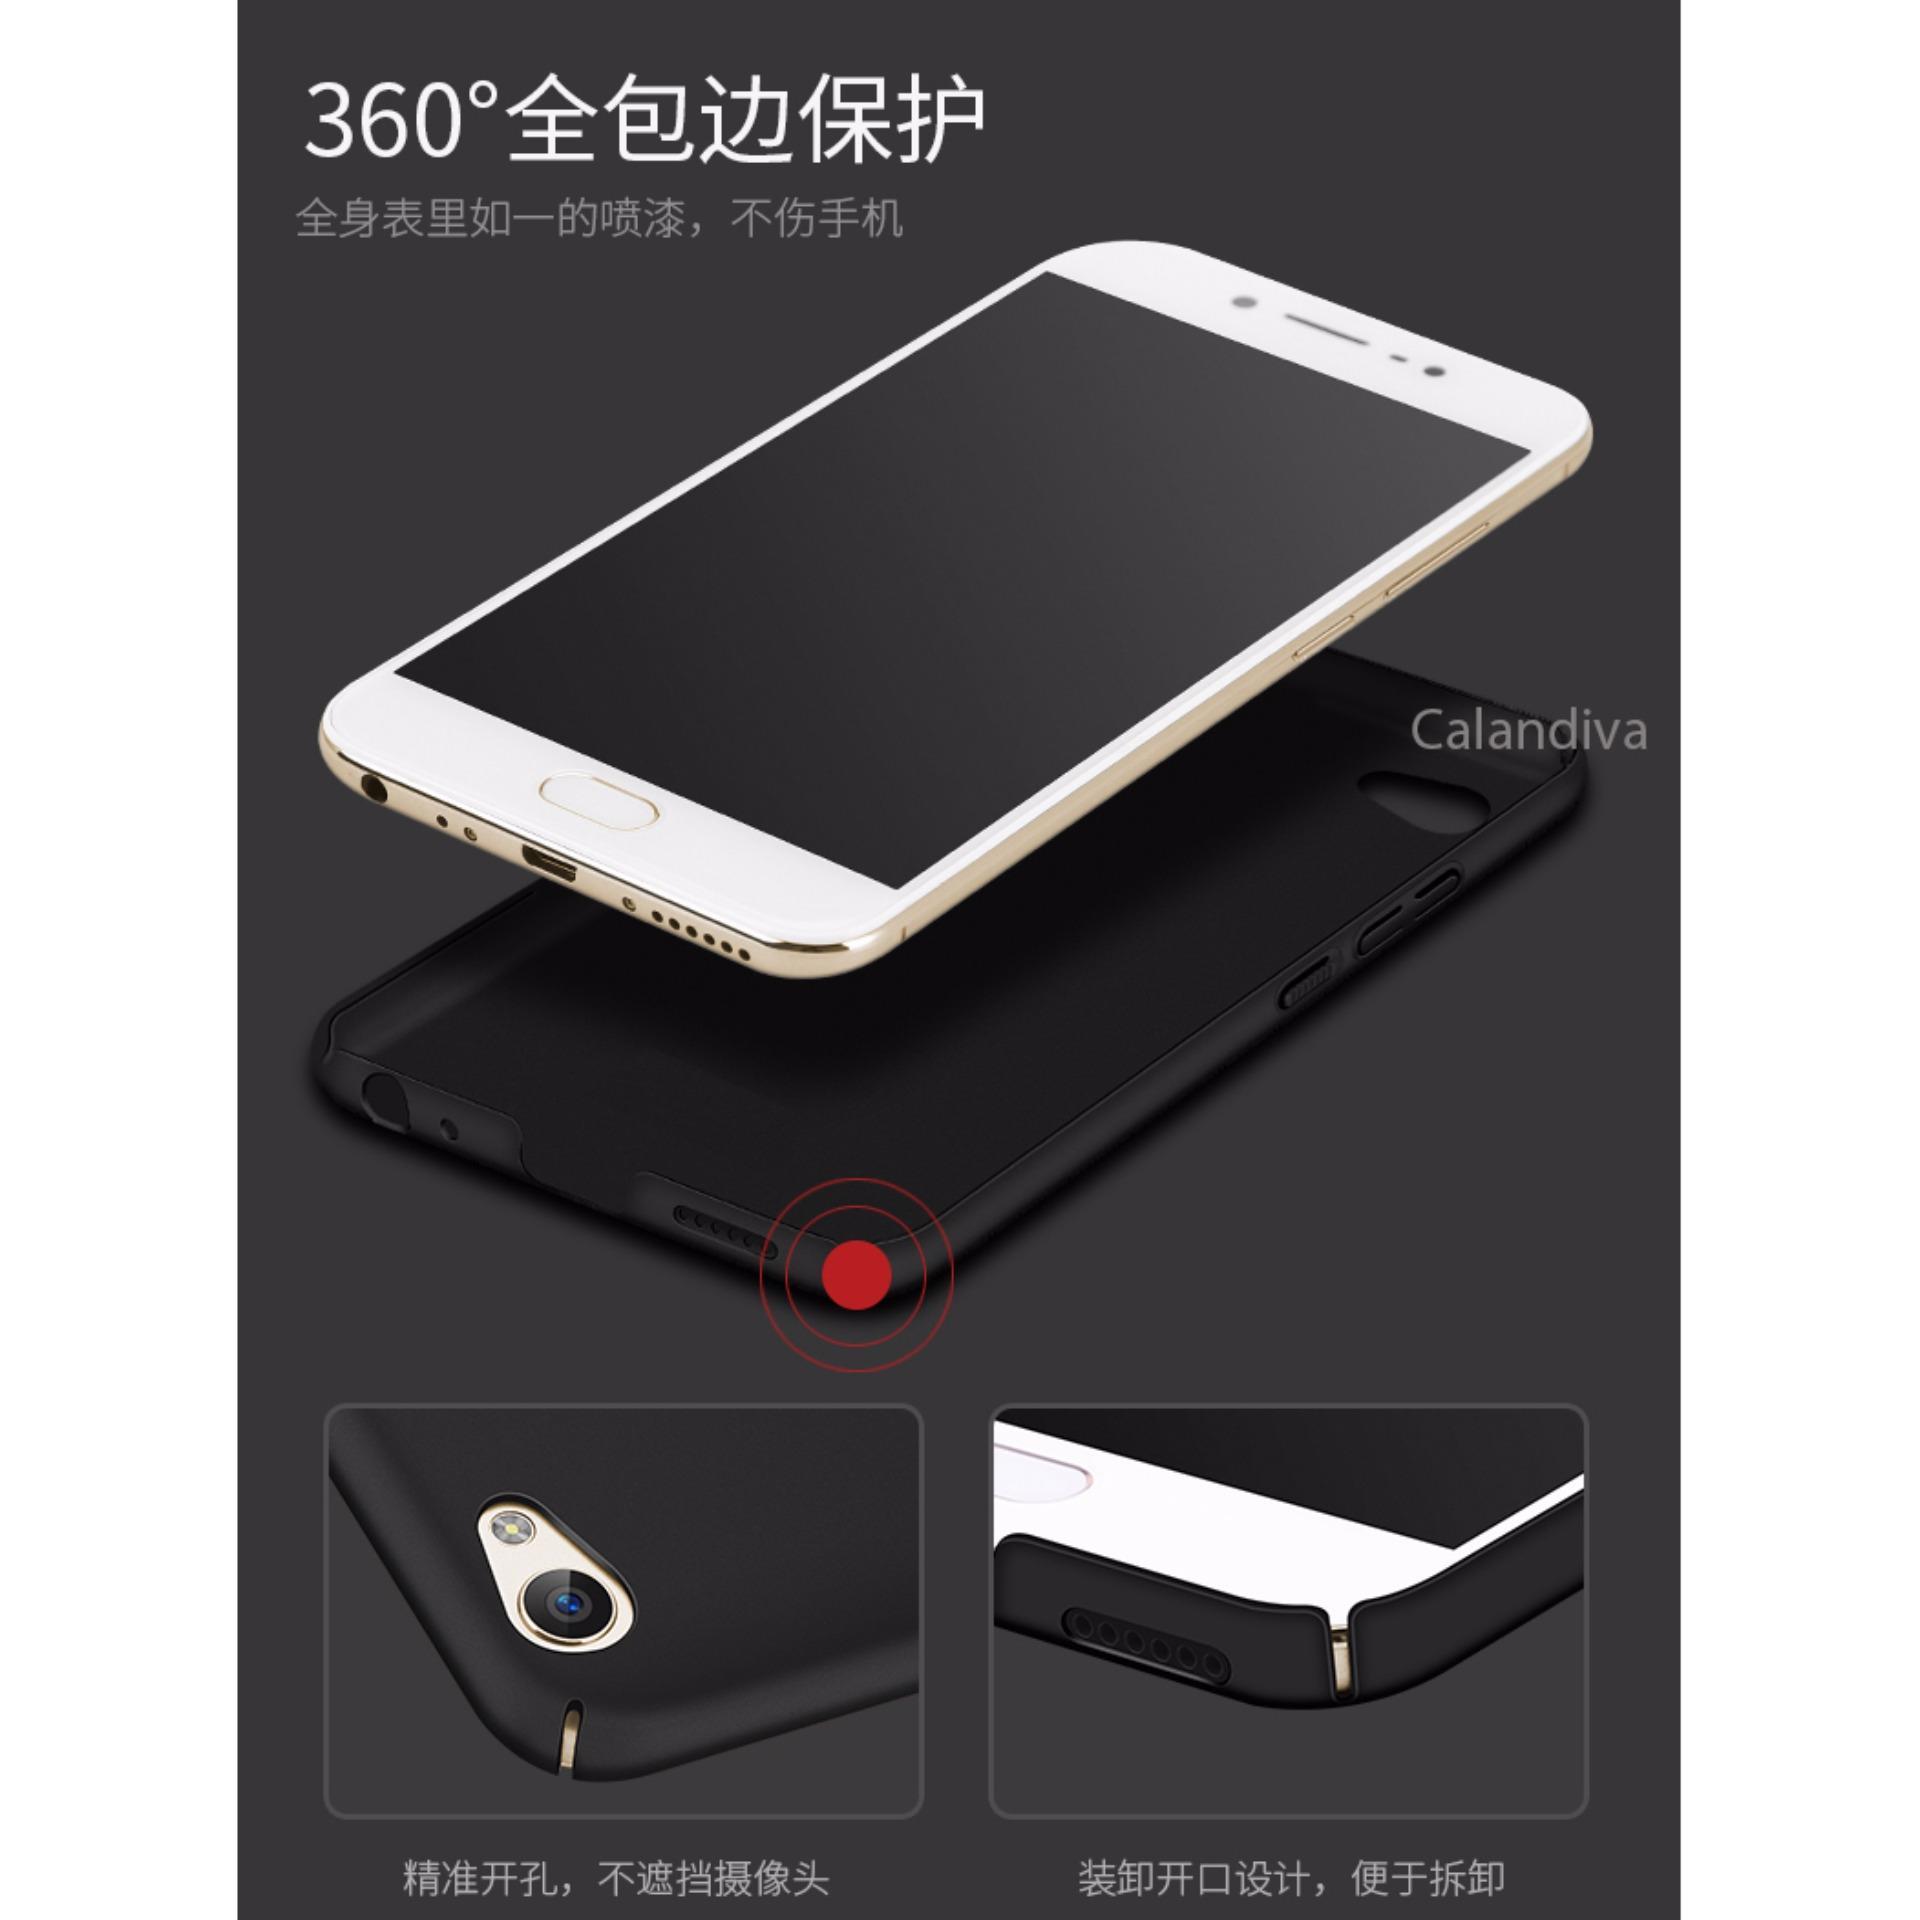 Calandiva 360 Degree Protection Slim HardCase for VIVO V5 / V5s / V5 Lite - Hitam